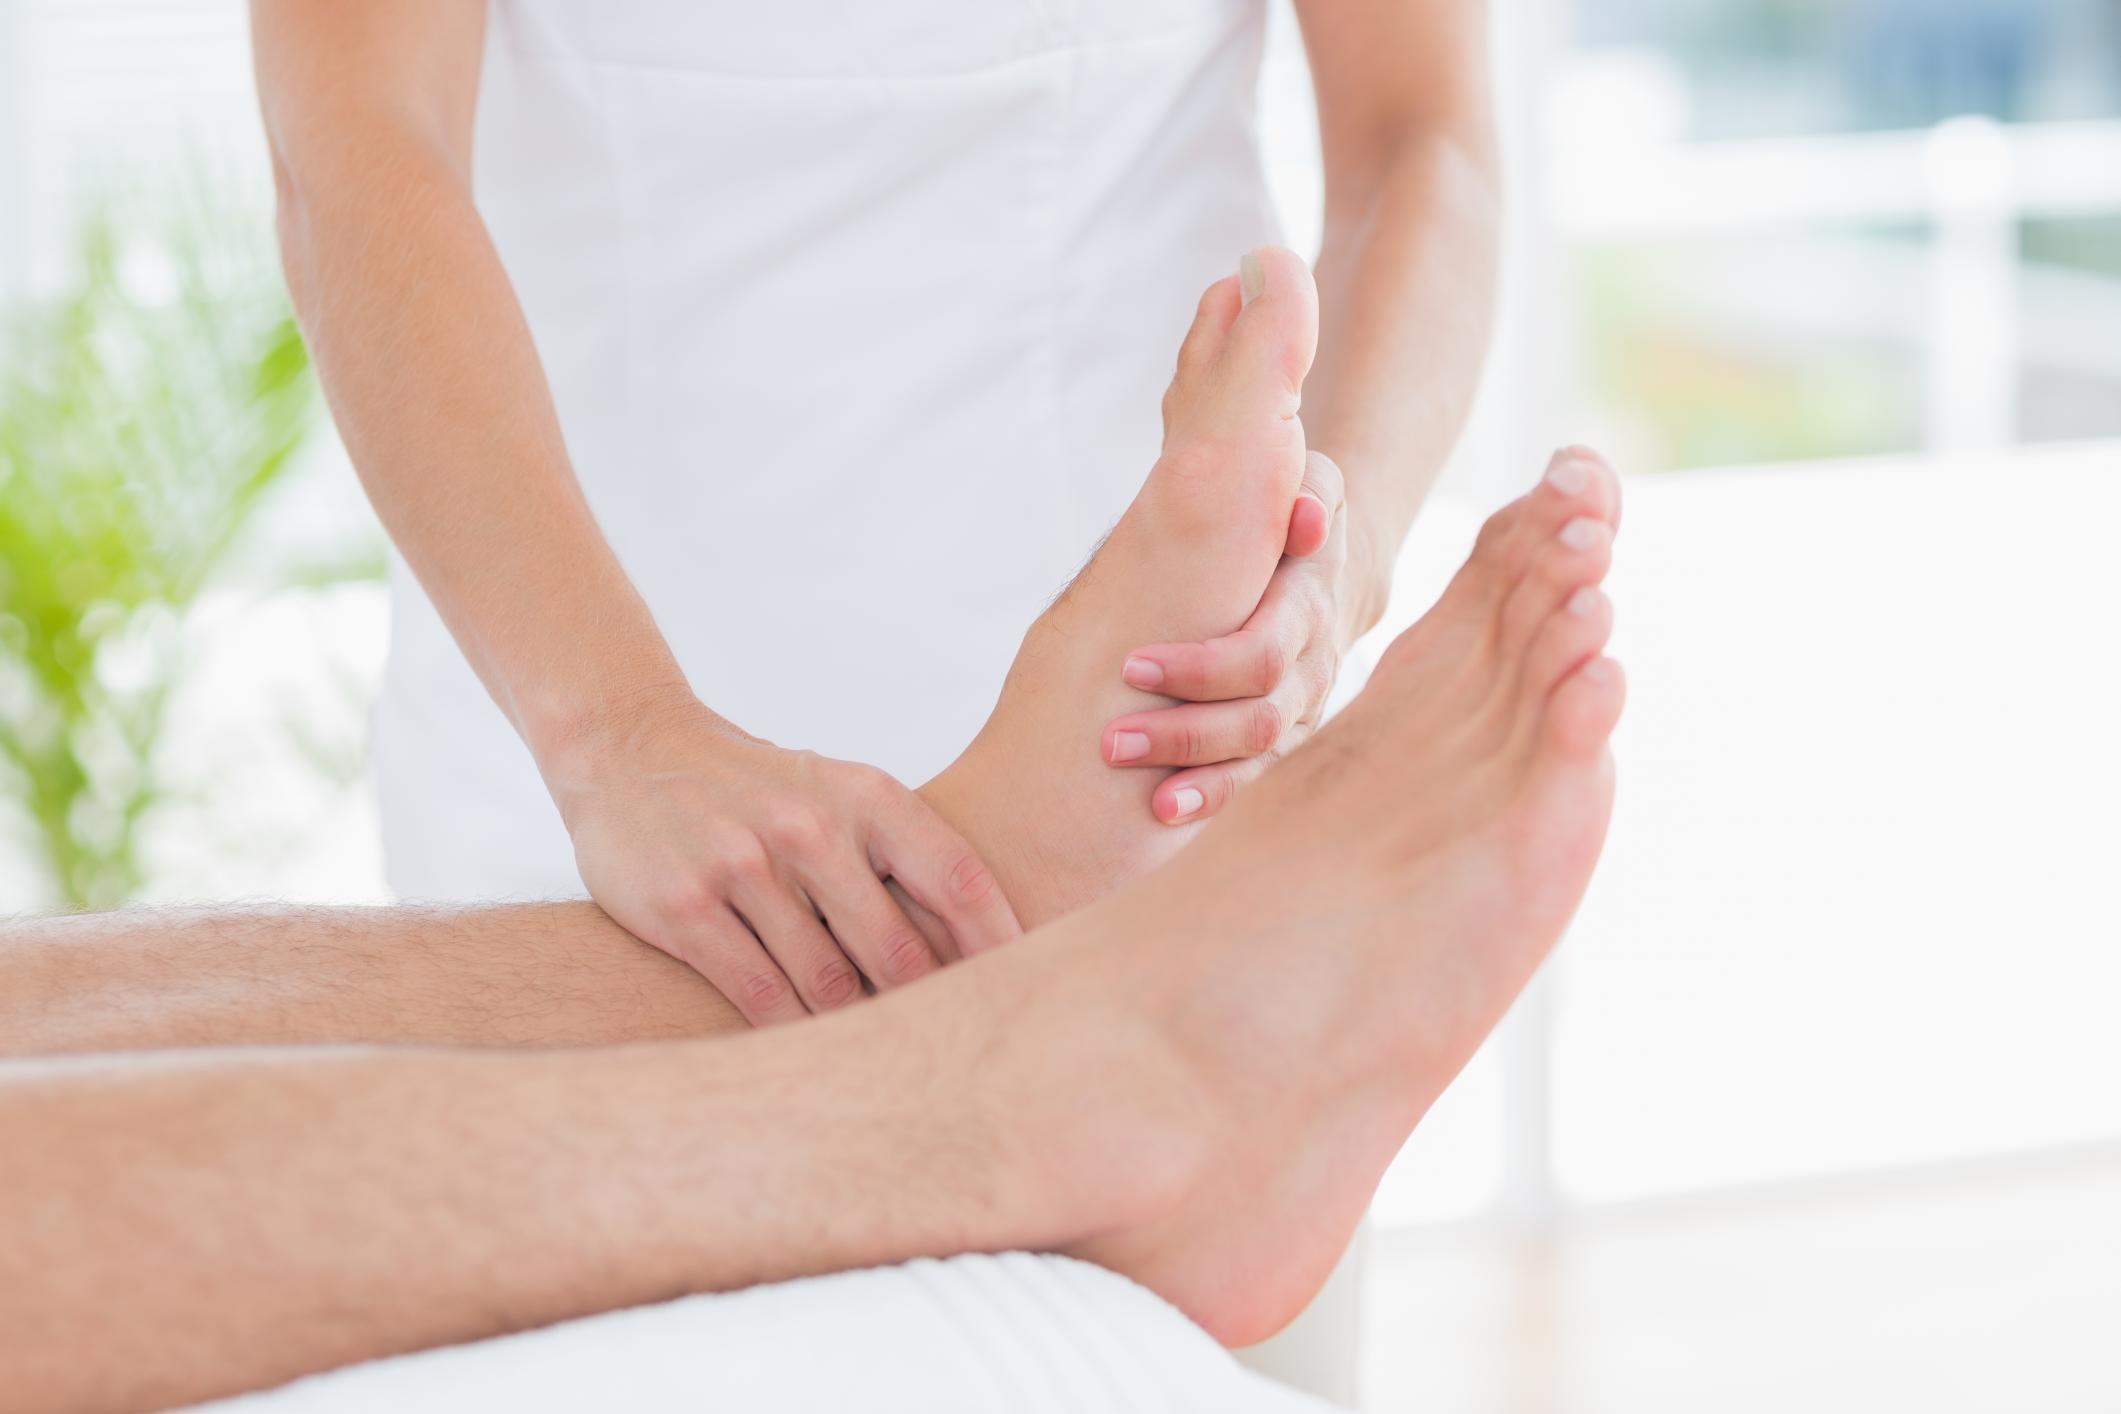 Massage therapist massaging feet